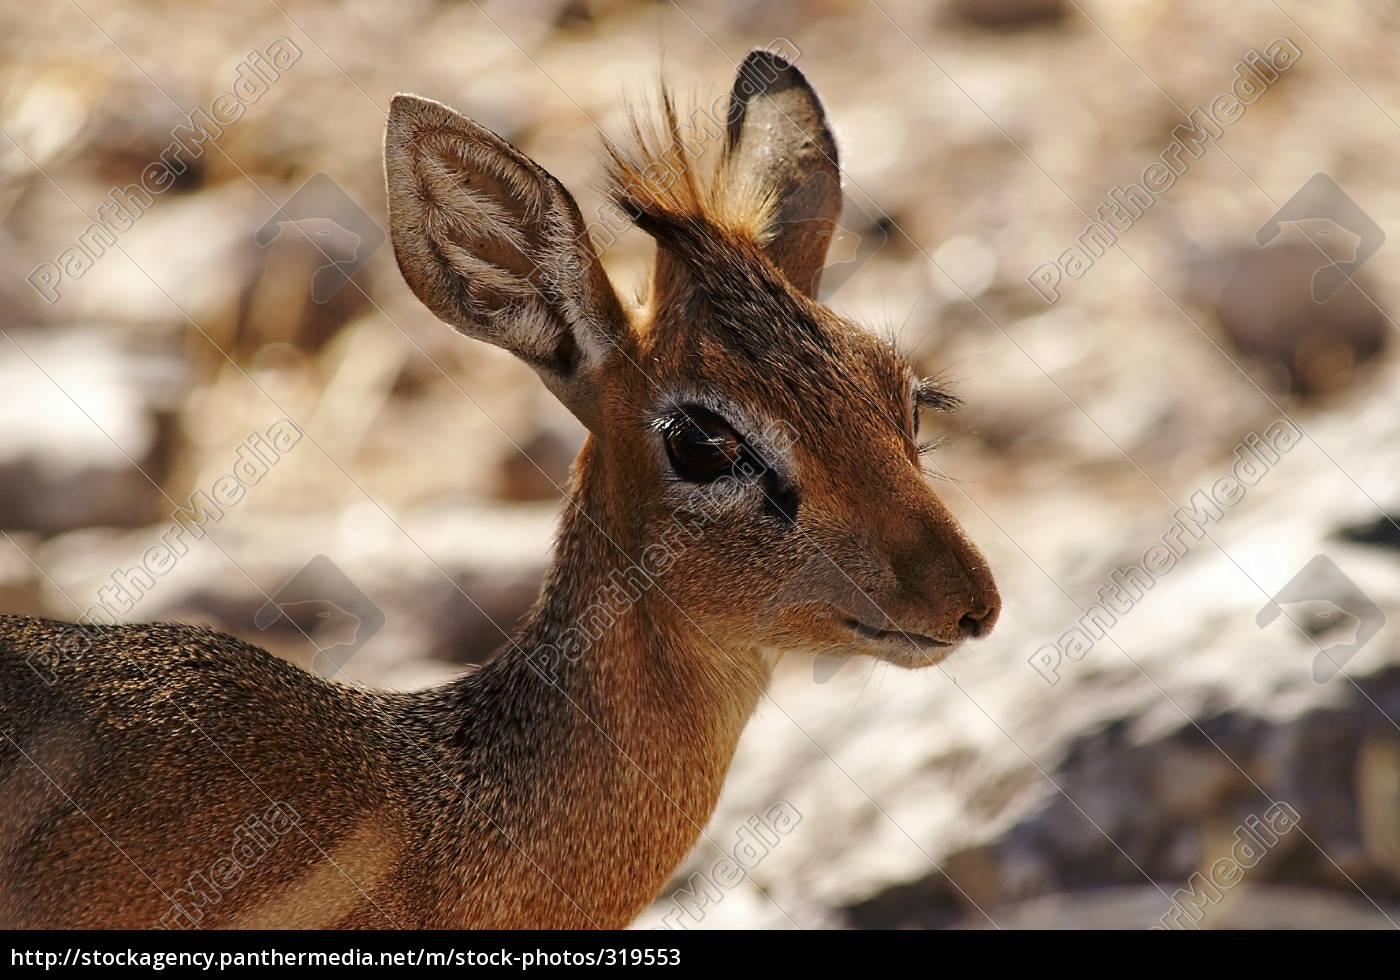 dik-dik, antelope - 319553